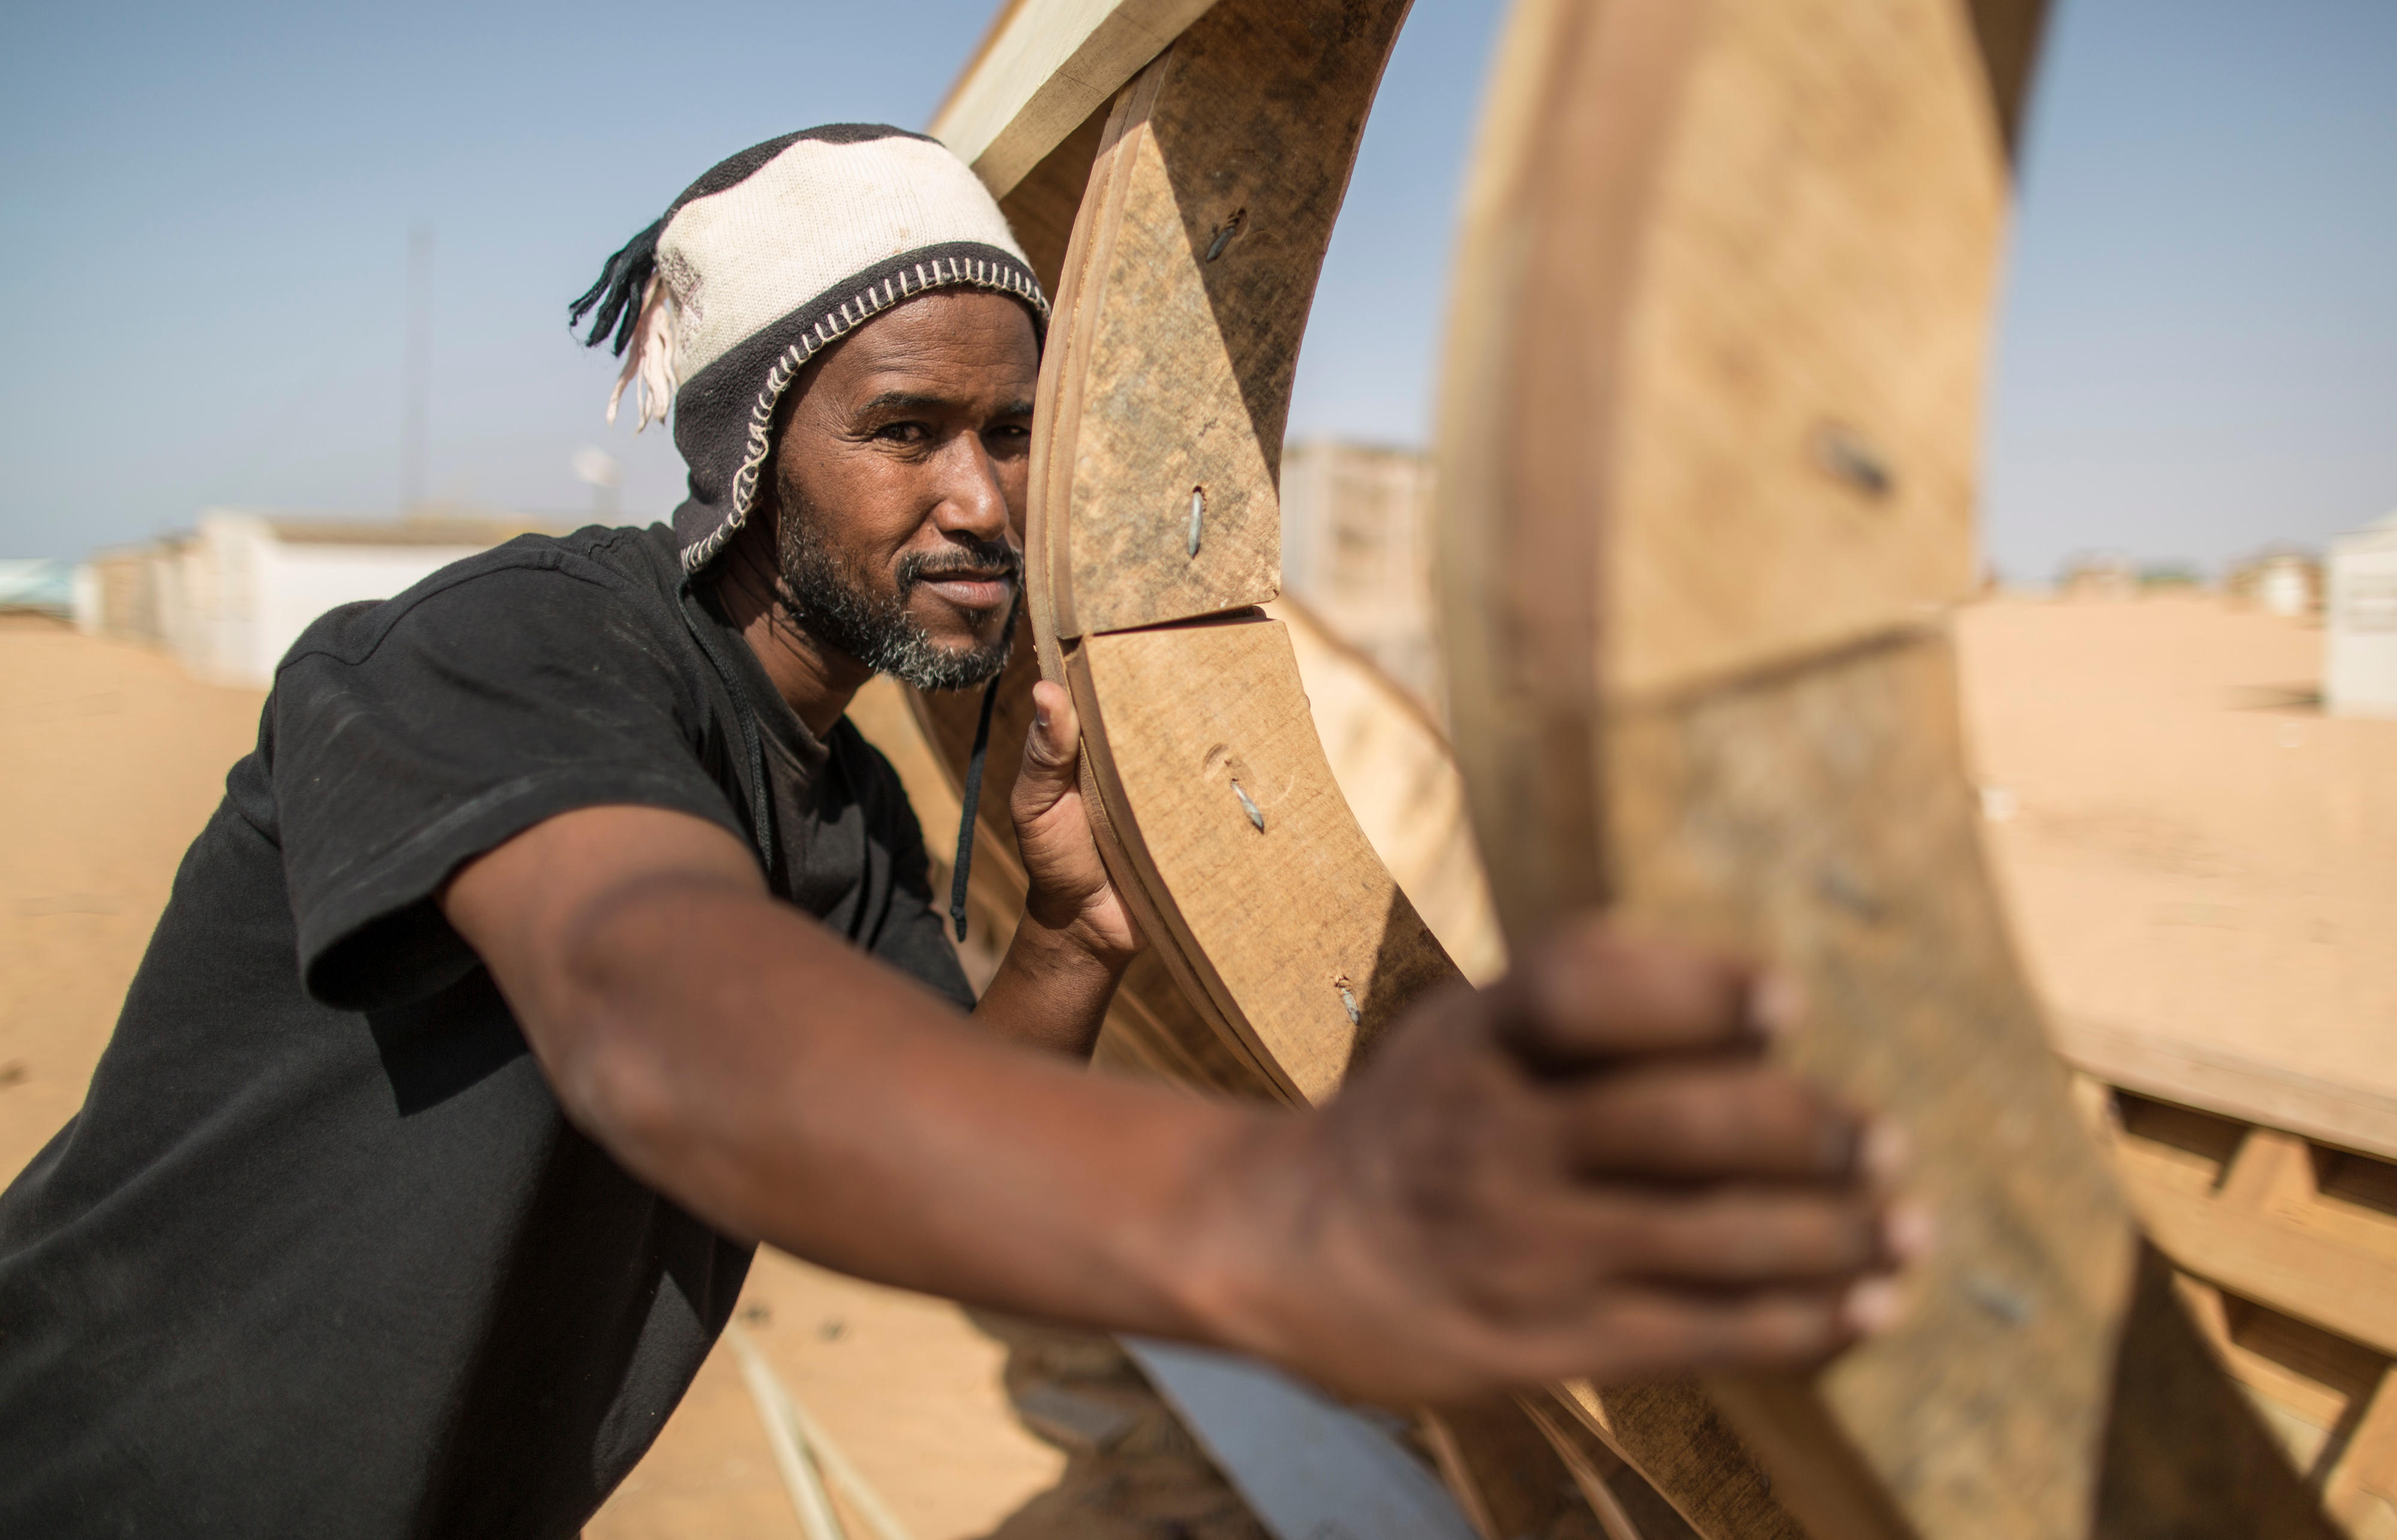 Bootsbauer in R'Gueiba, Nationalpark Banc d'Arguin, Mauretanien